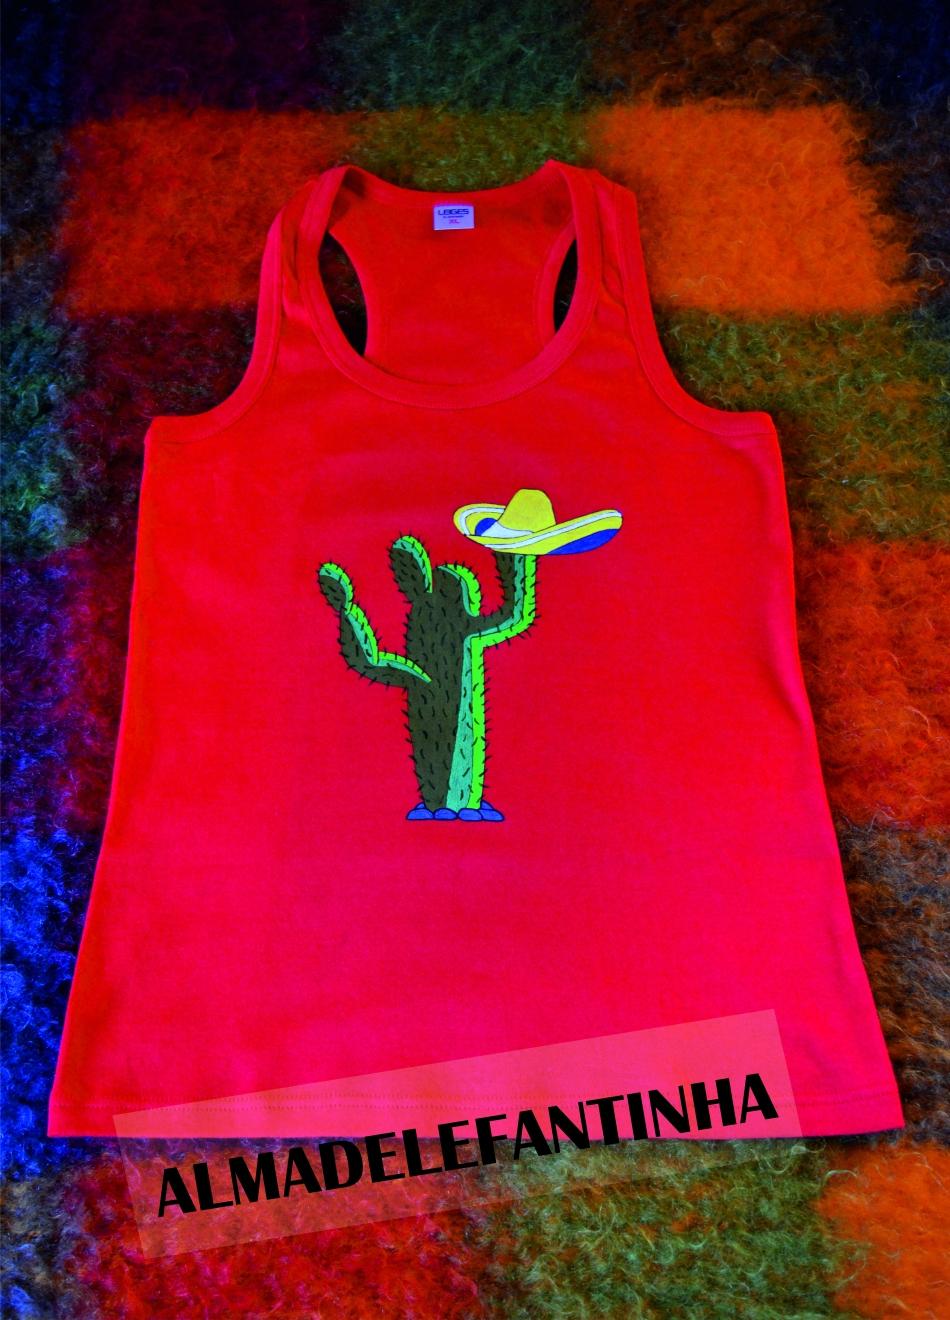 cactus_almadelefantinha01